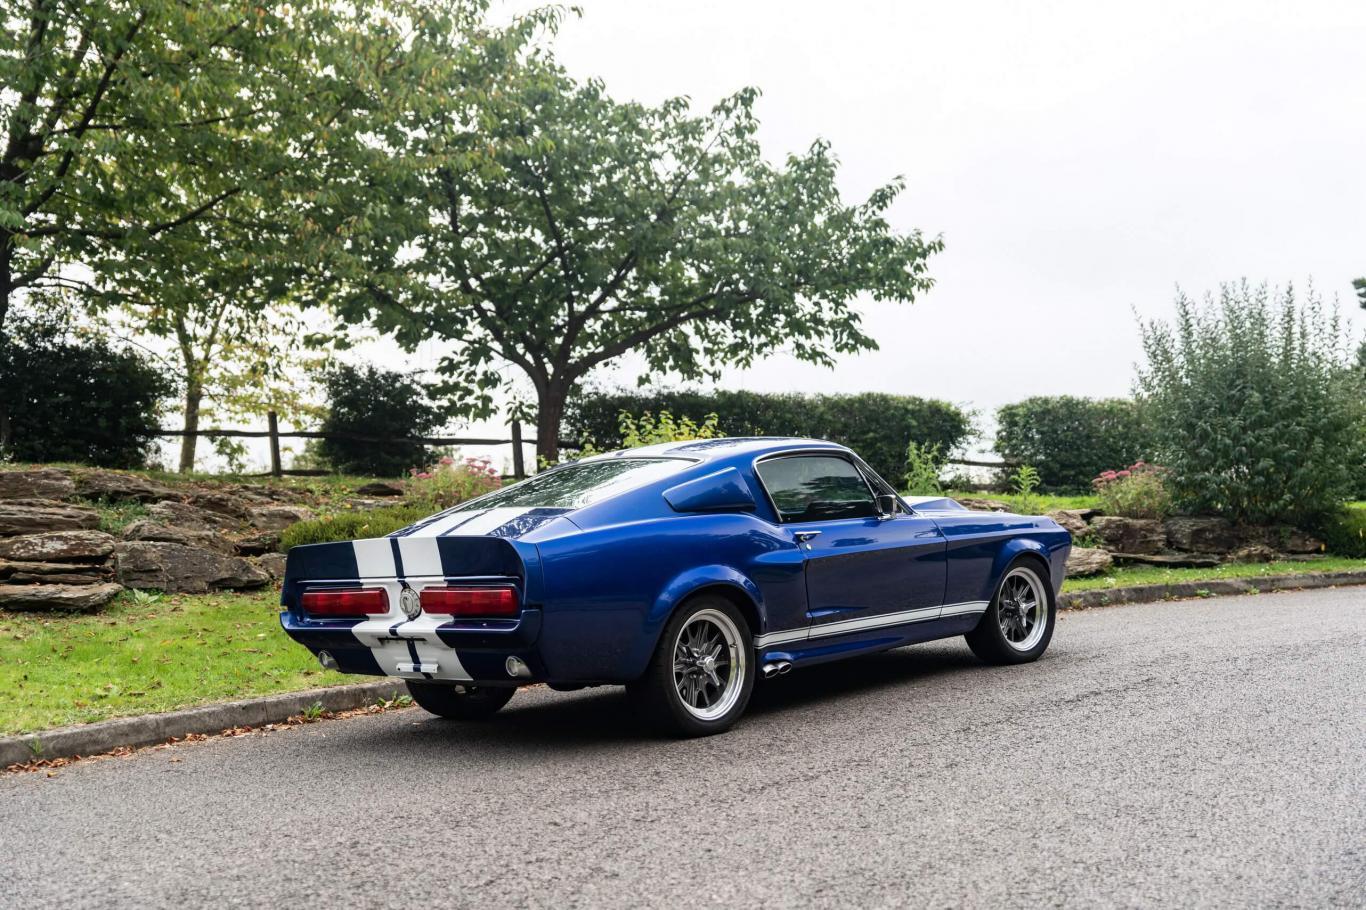 Ford Mustang Fastback >> Ford Mustang Fastback Eleanor